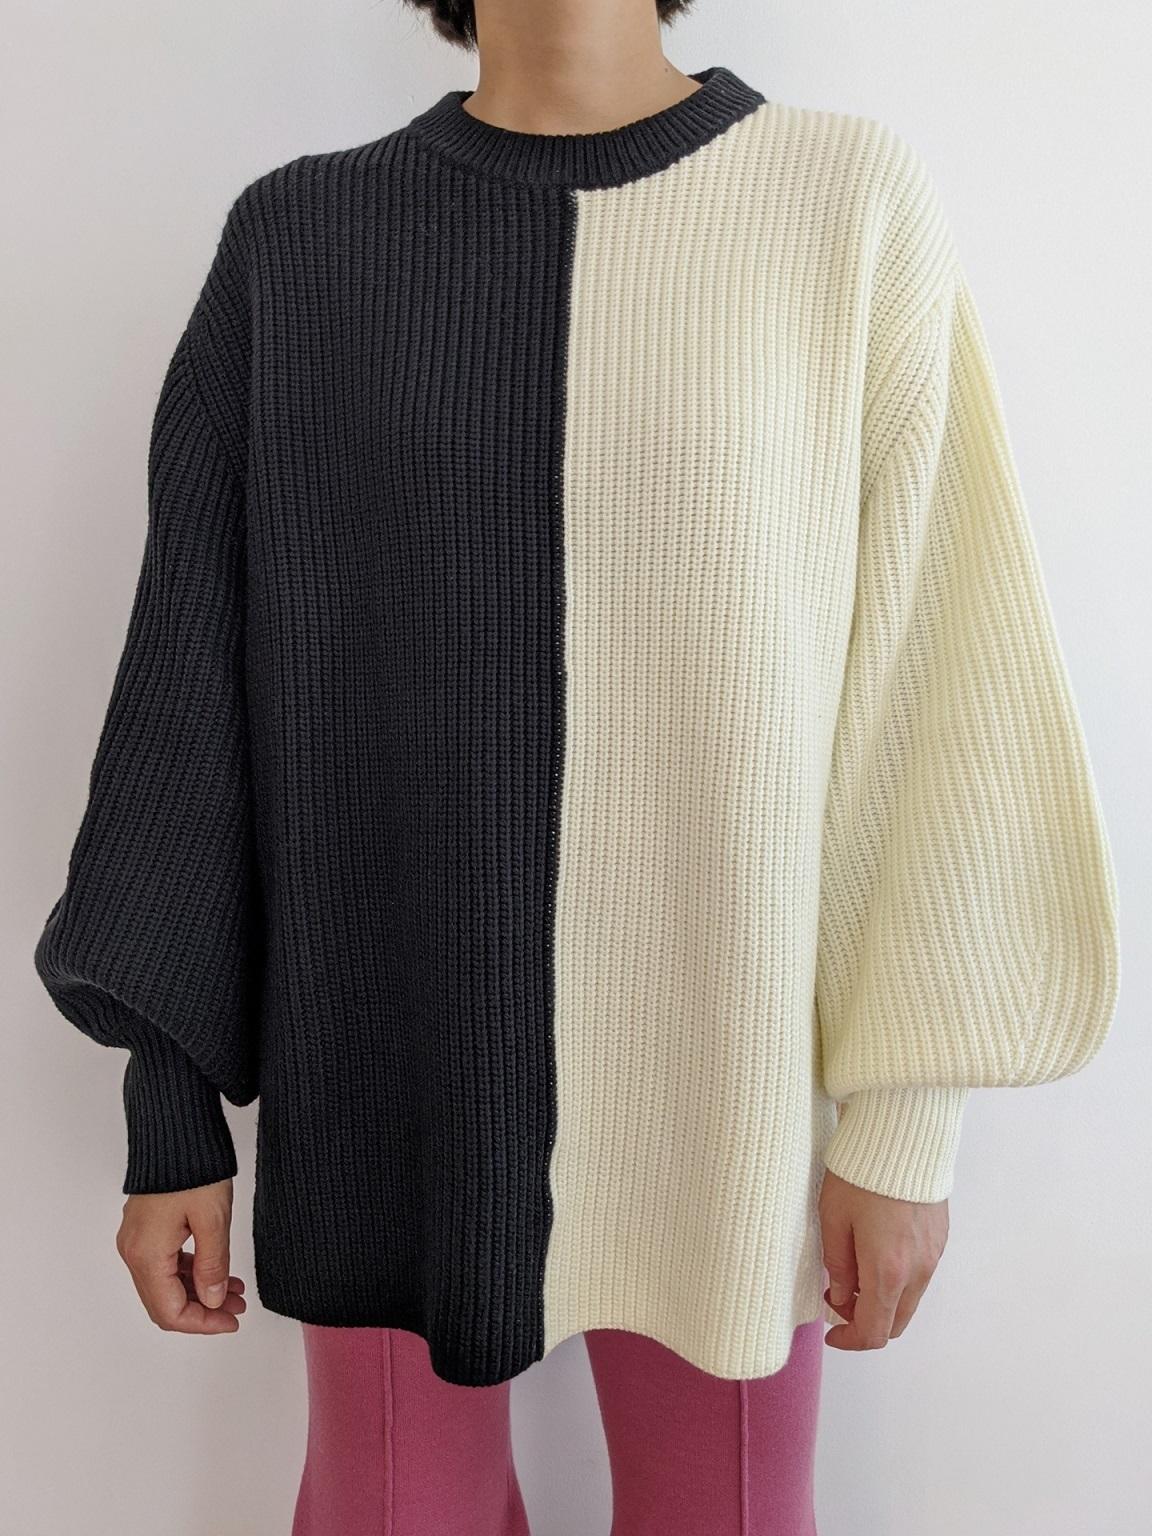 Bicolor Pullover - Black/White